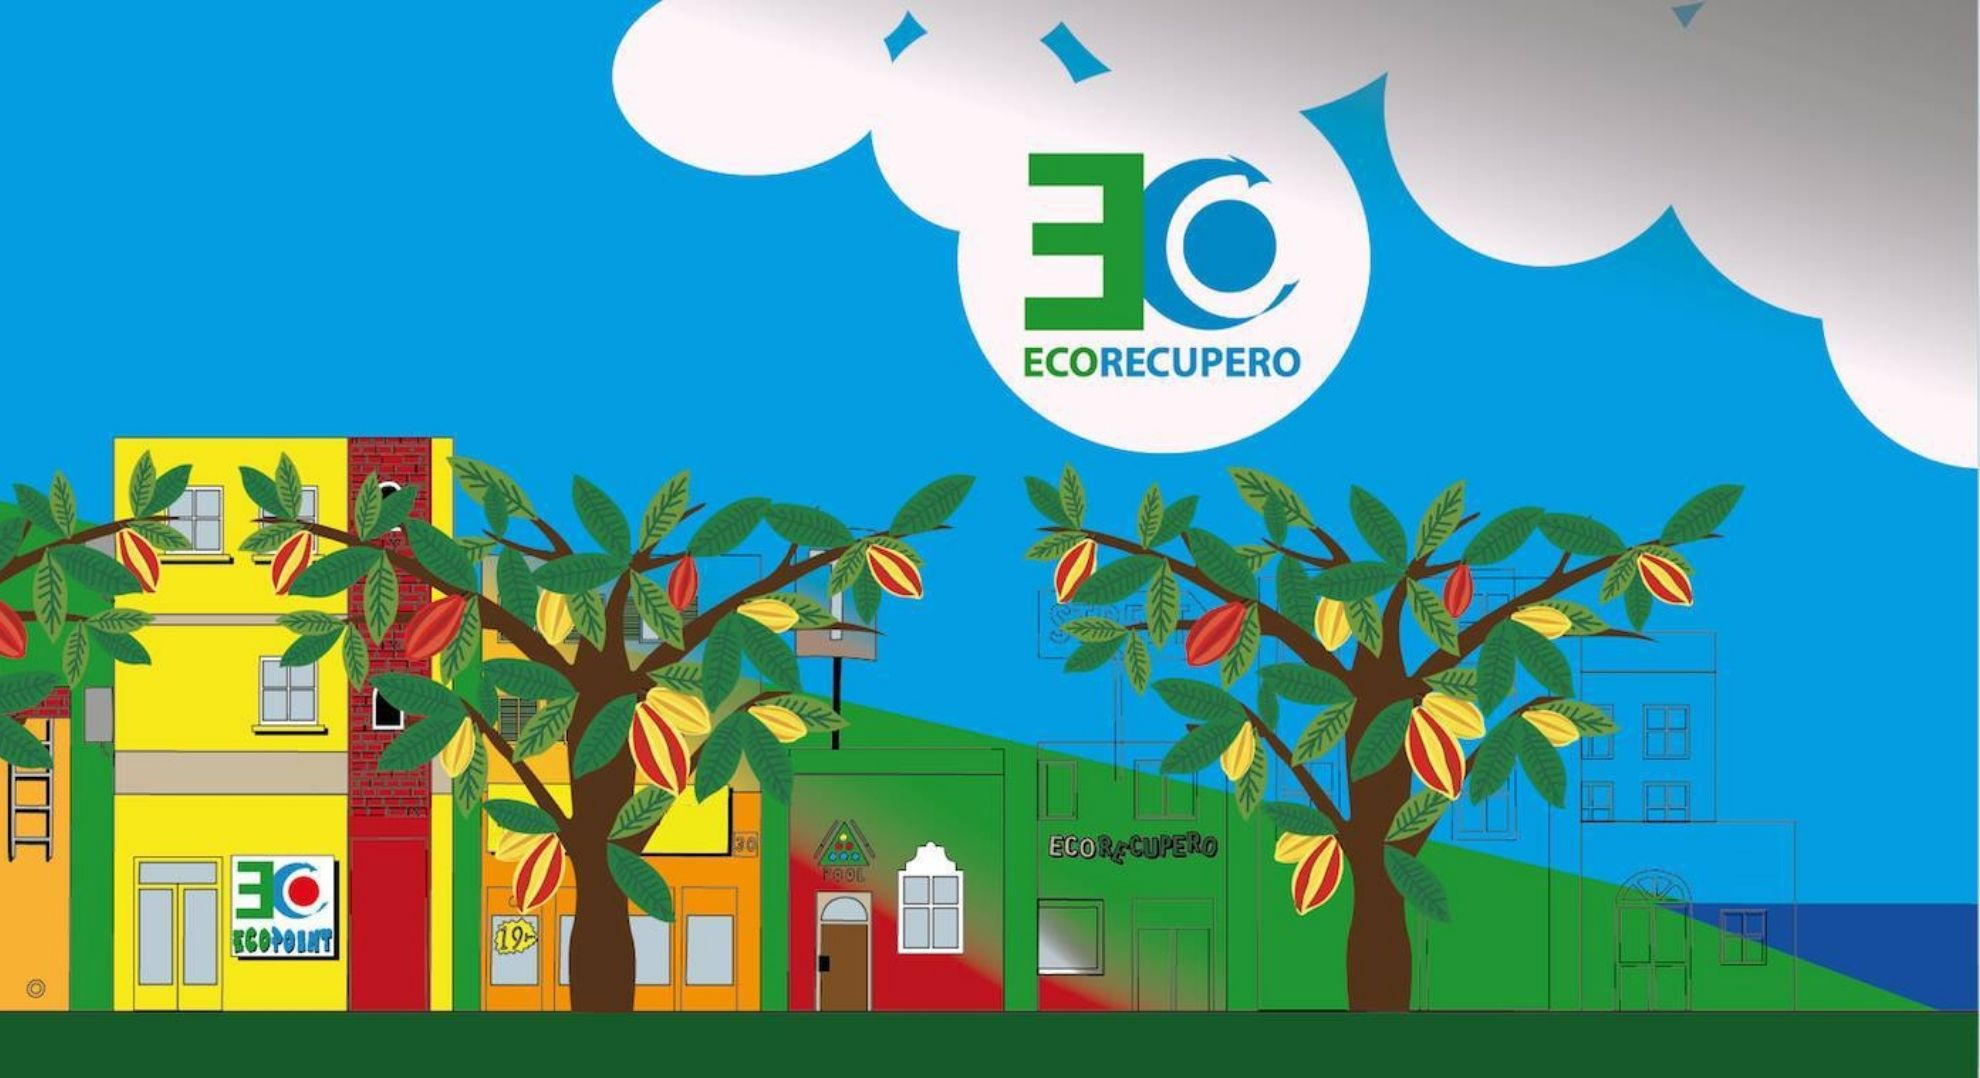 Ecorecupero